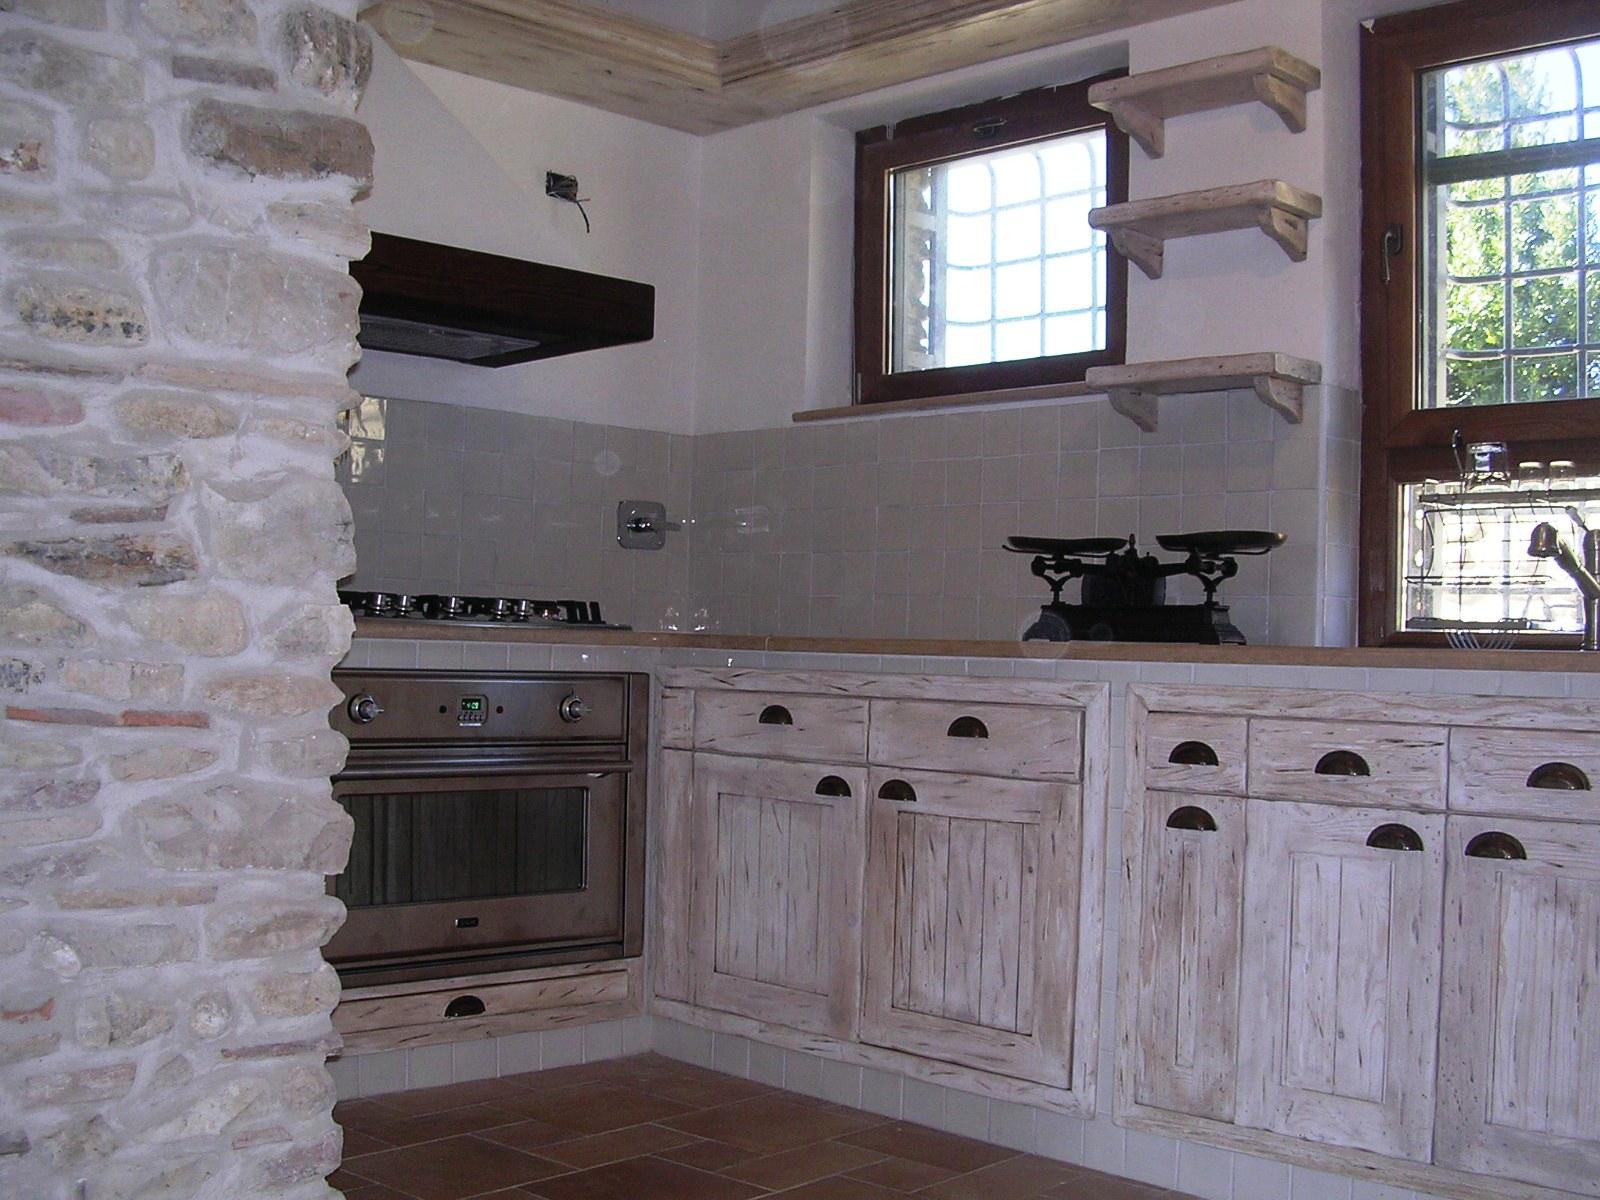 Cucine | Falegnameria RD Arredamenti s.r.l. Roma Armadi su misura ...